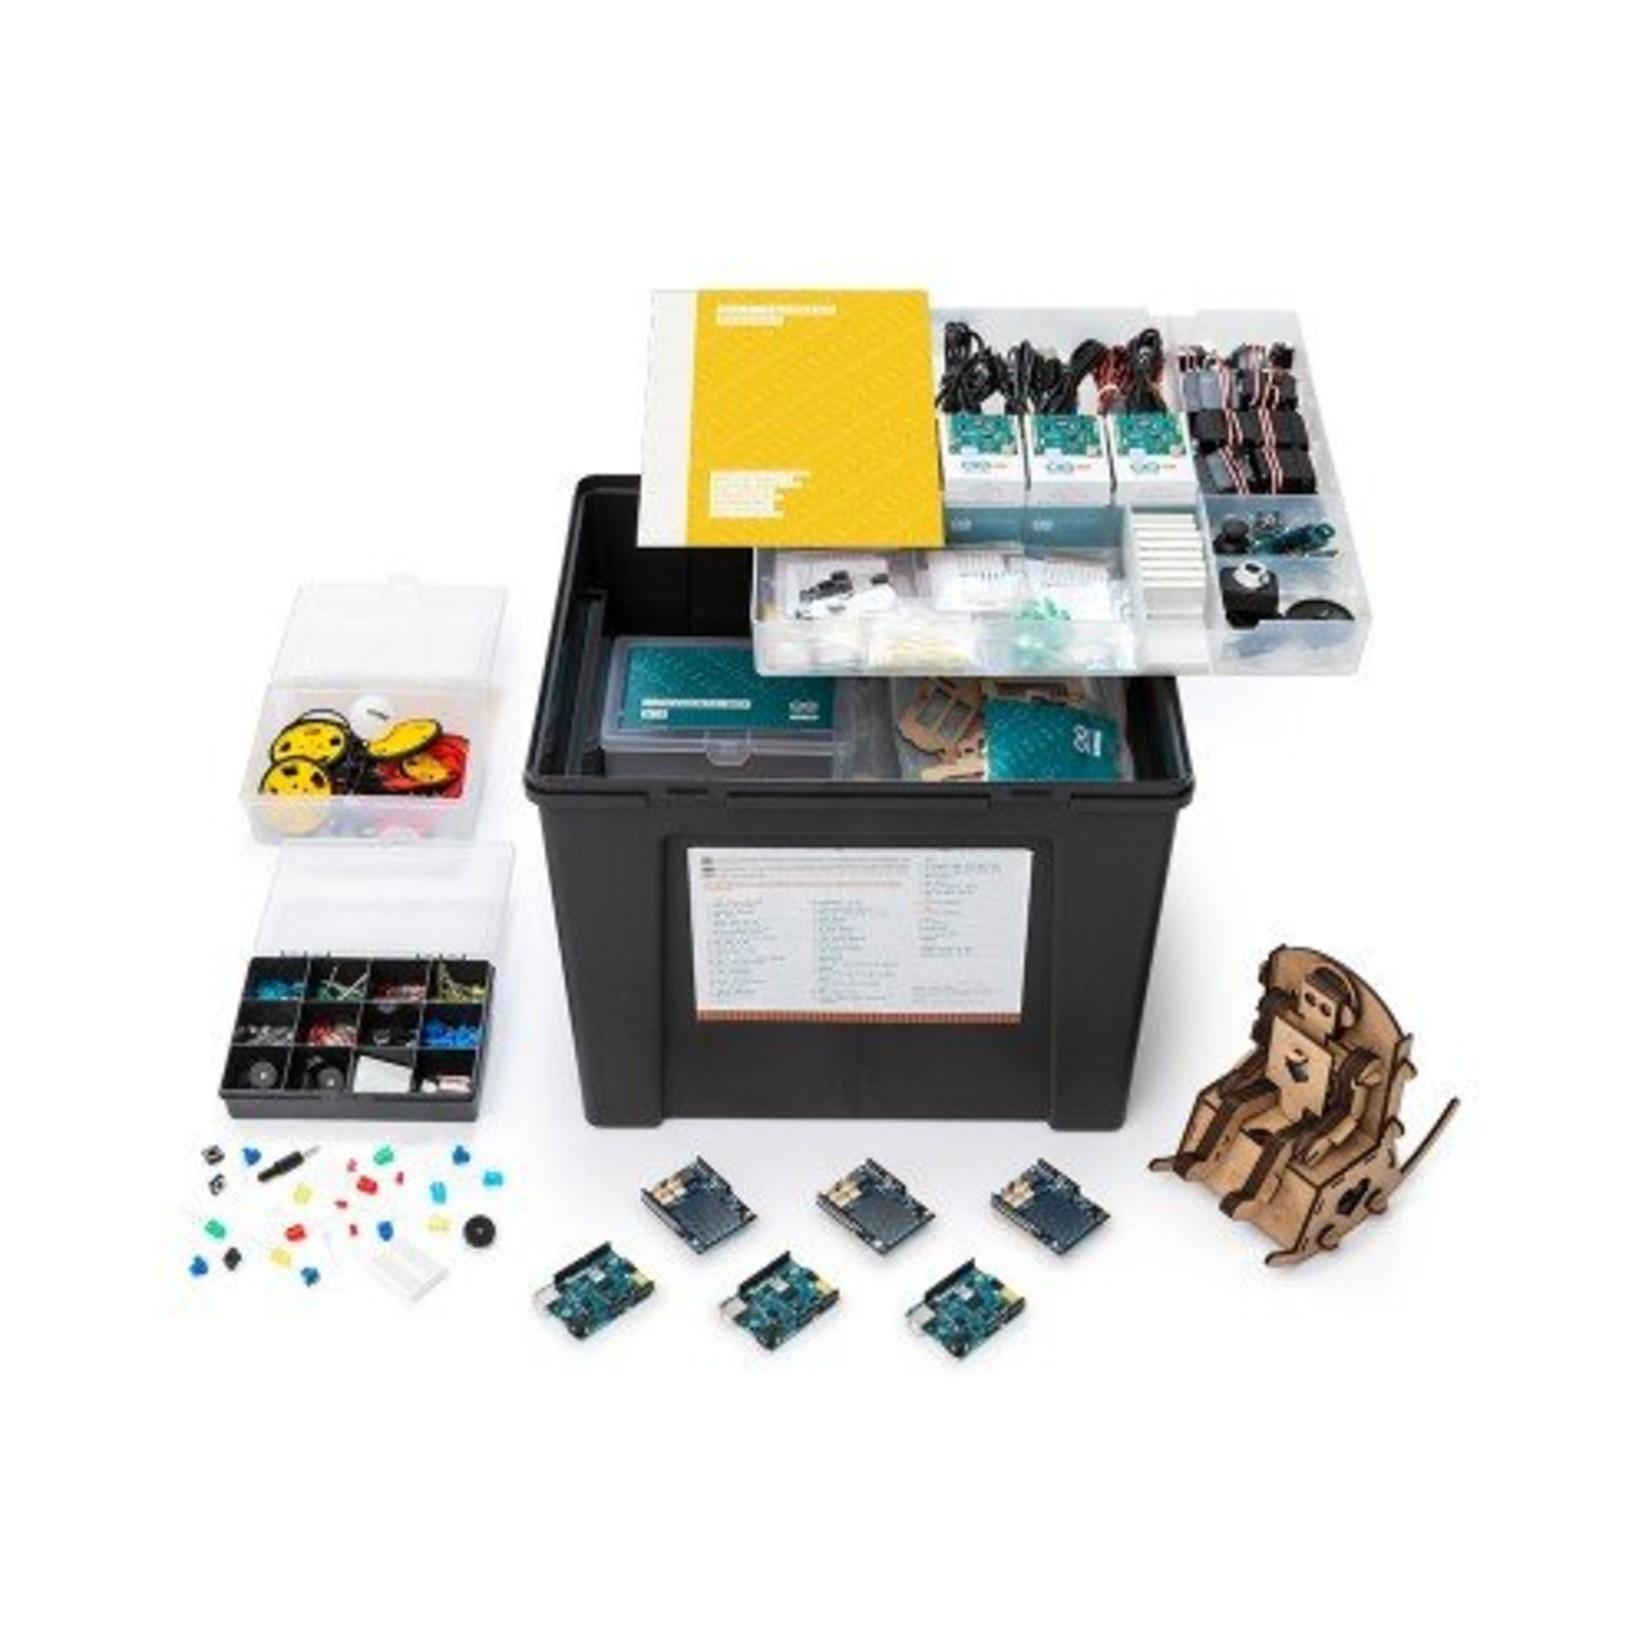 ARDUINO ARDUINO CTC 101 - modular STEAM projects - Self Learning